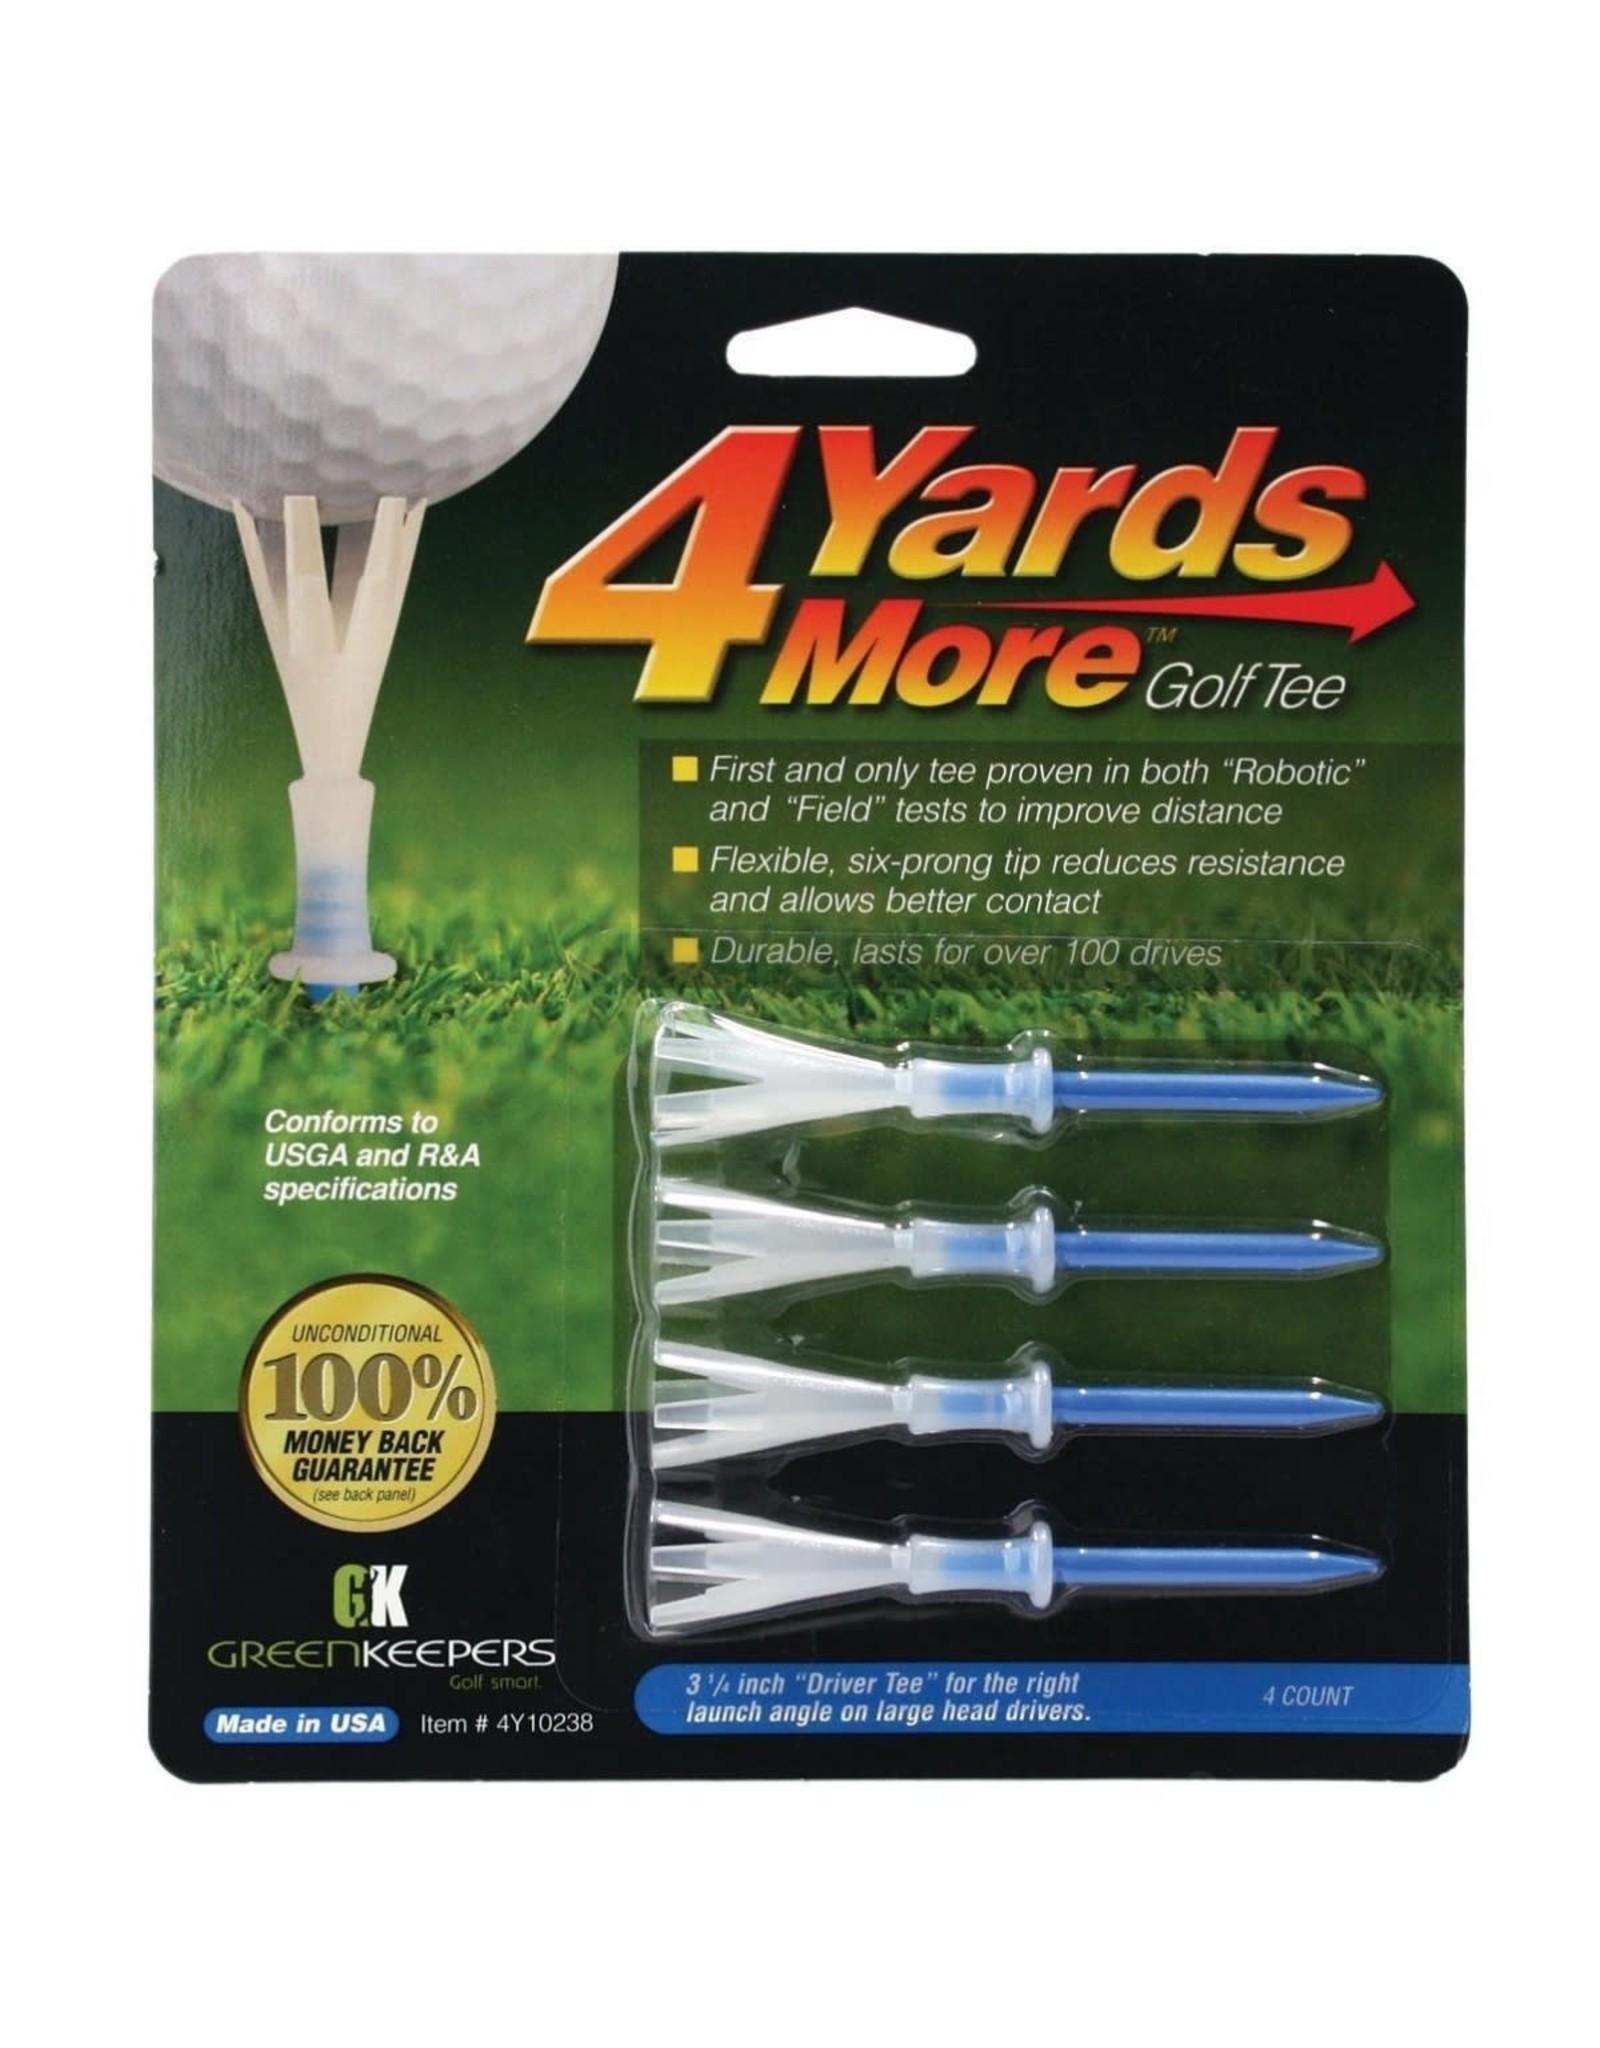 4 Yards More Golf Tee